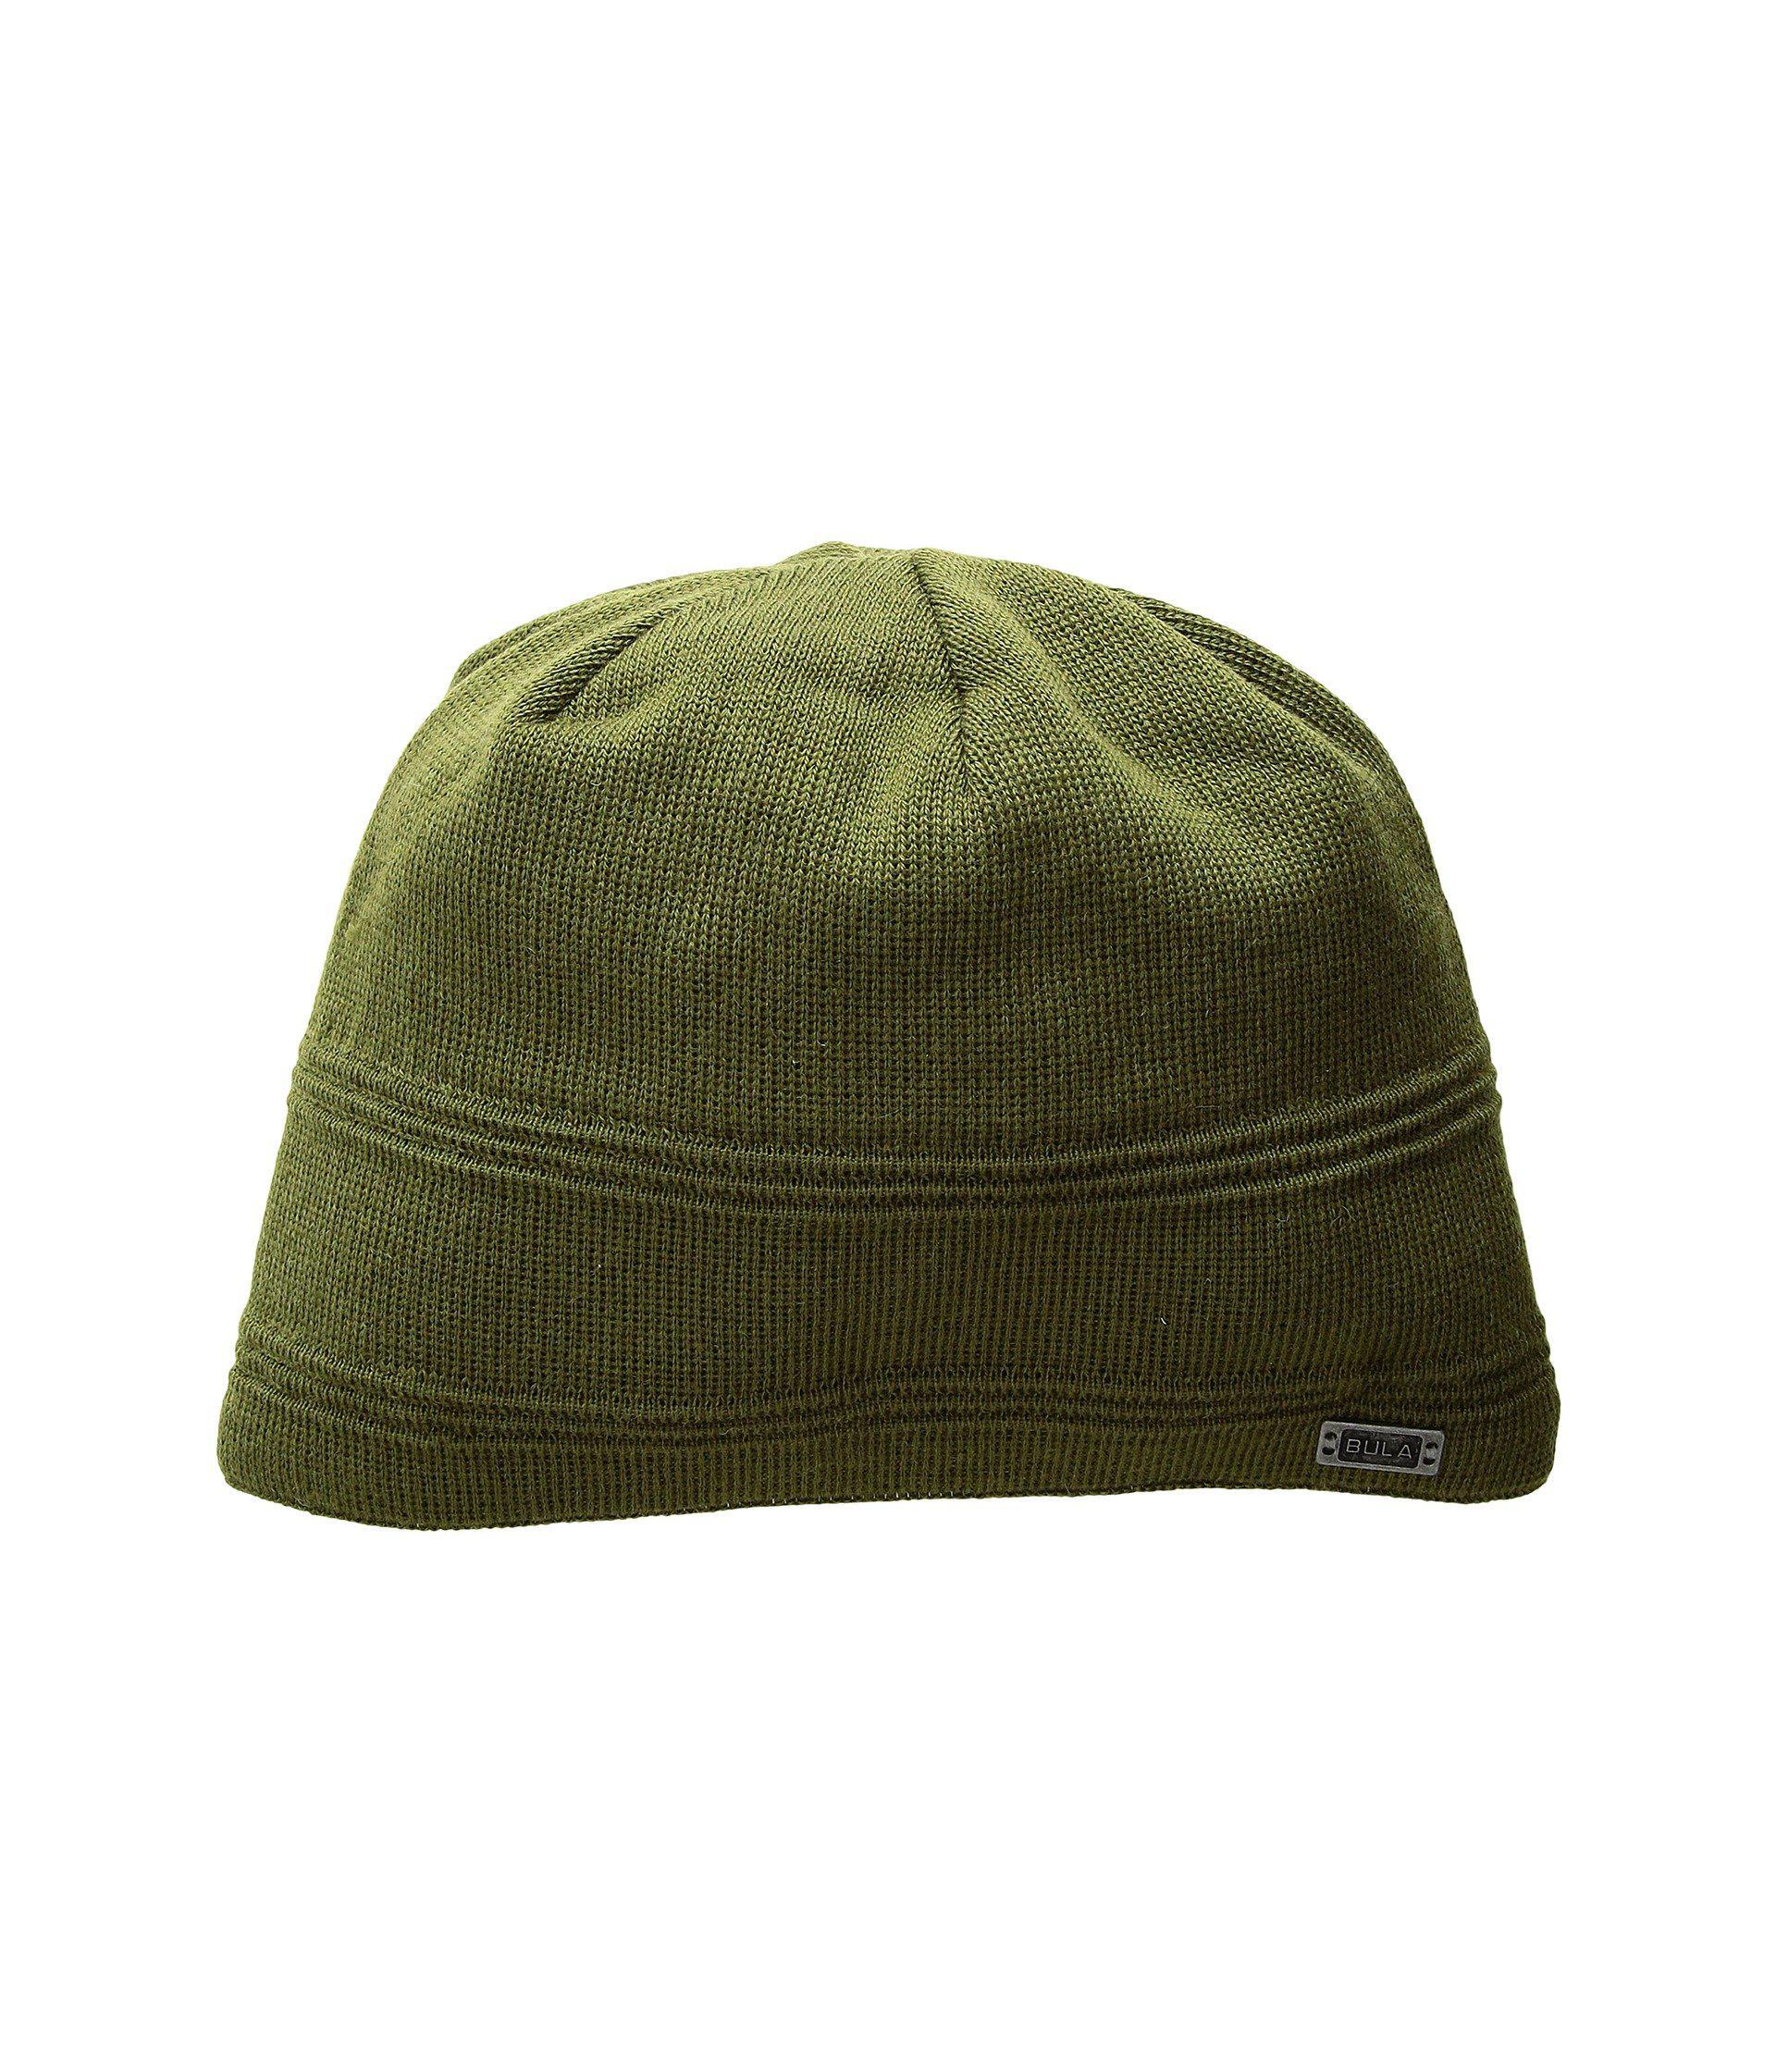 411717642b6976 Lyst - Bula Classic Beanie in Green for Men